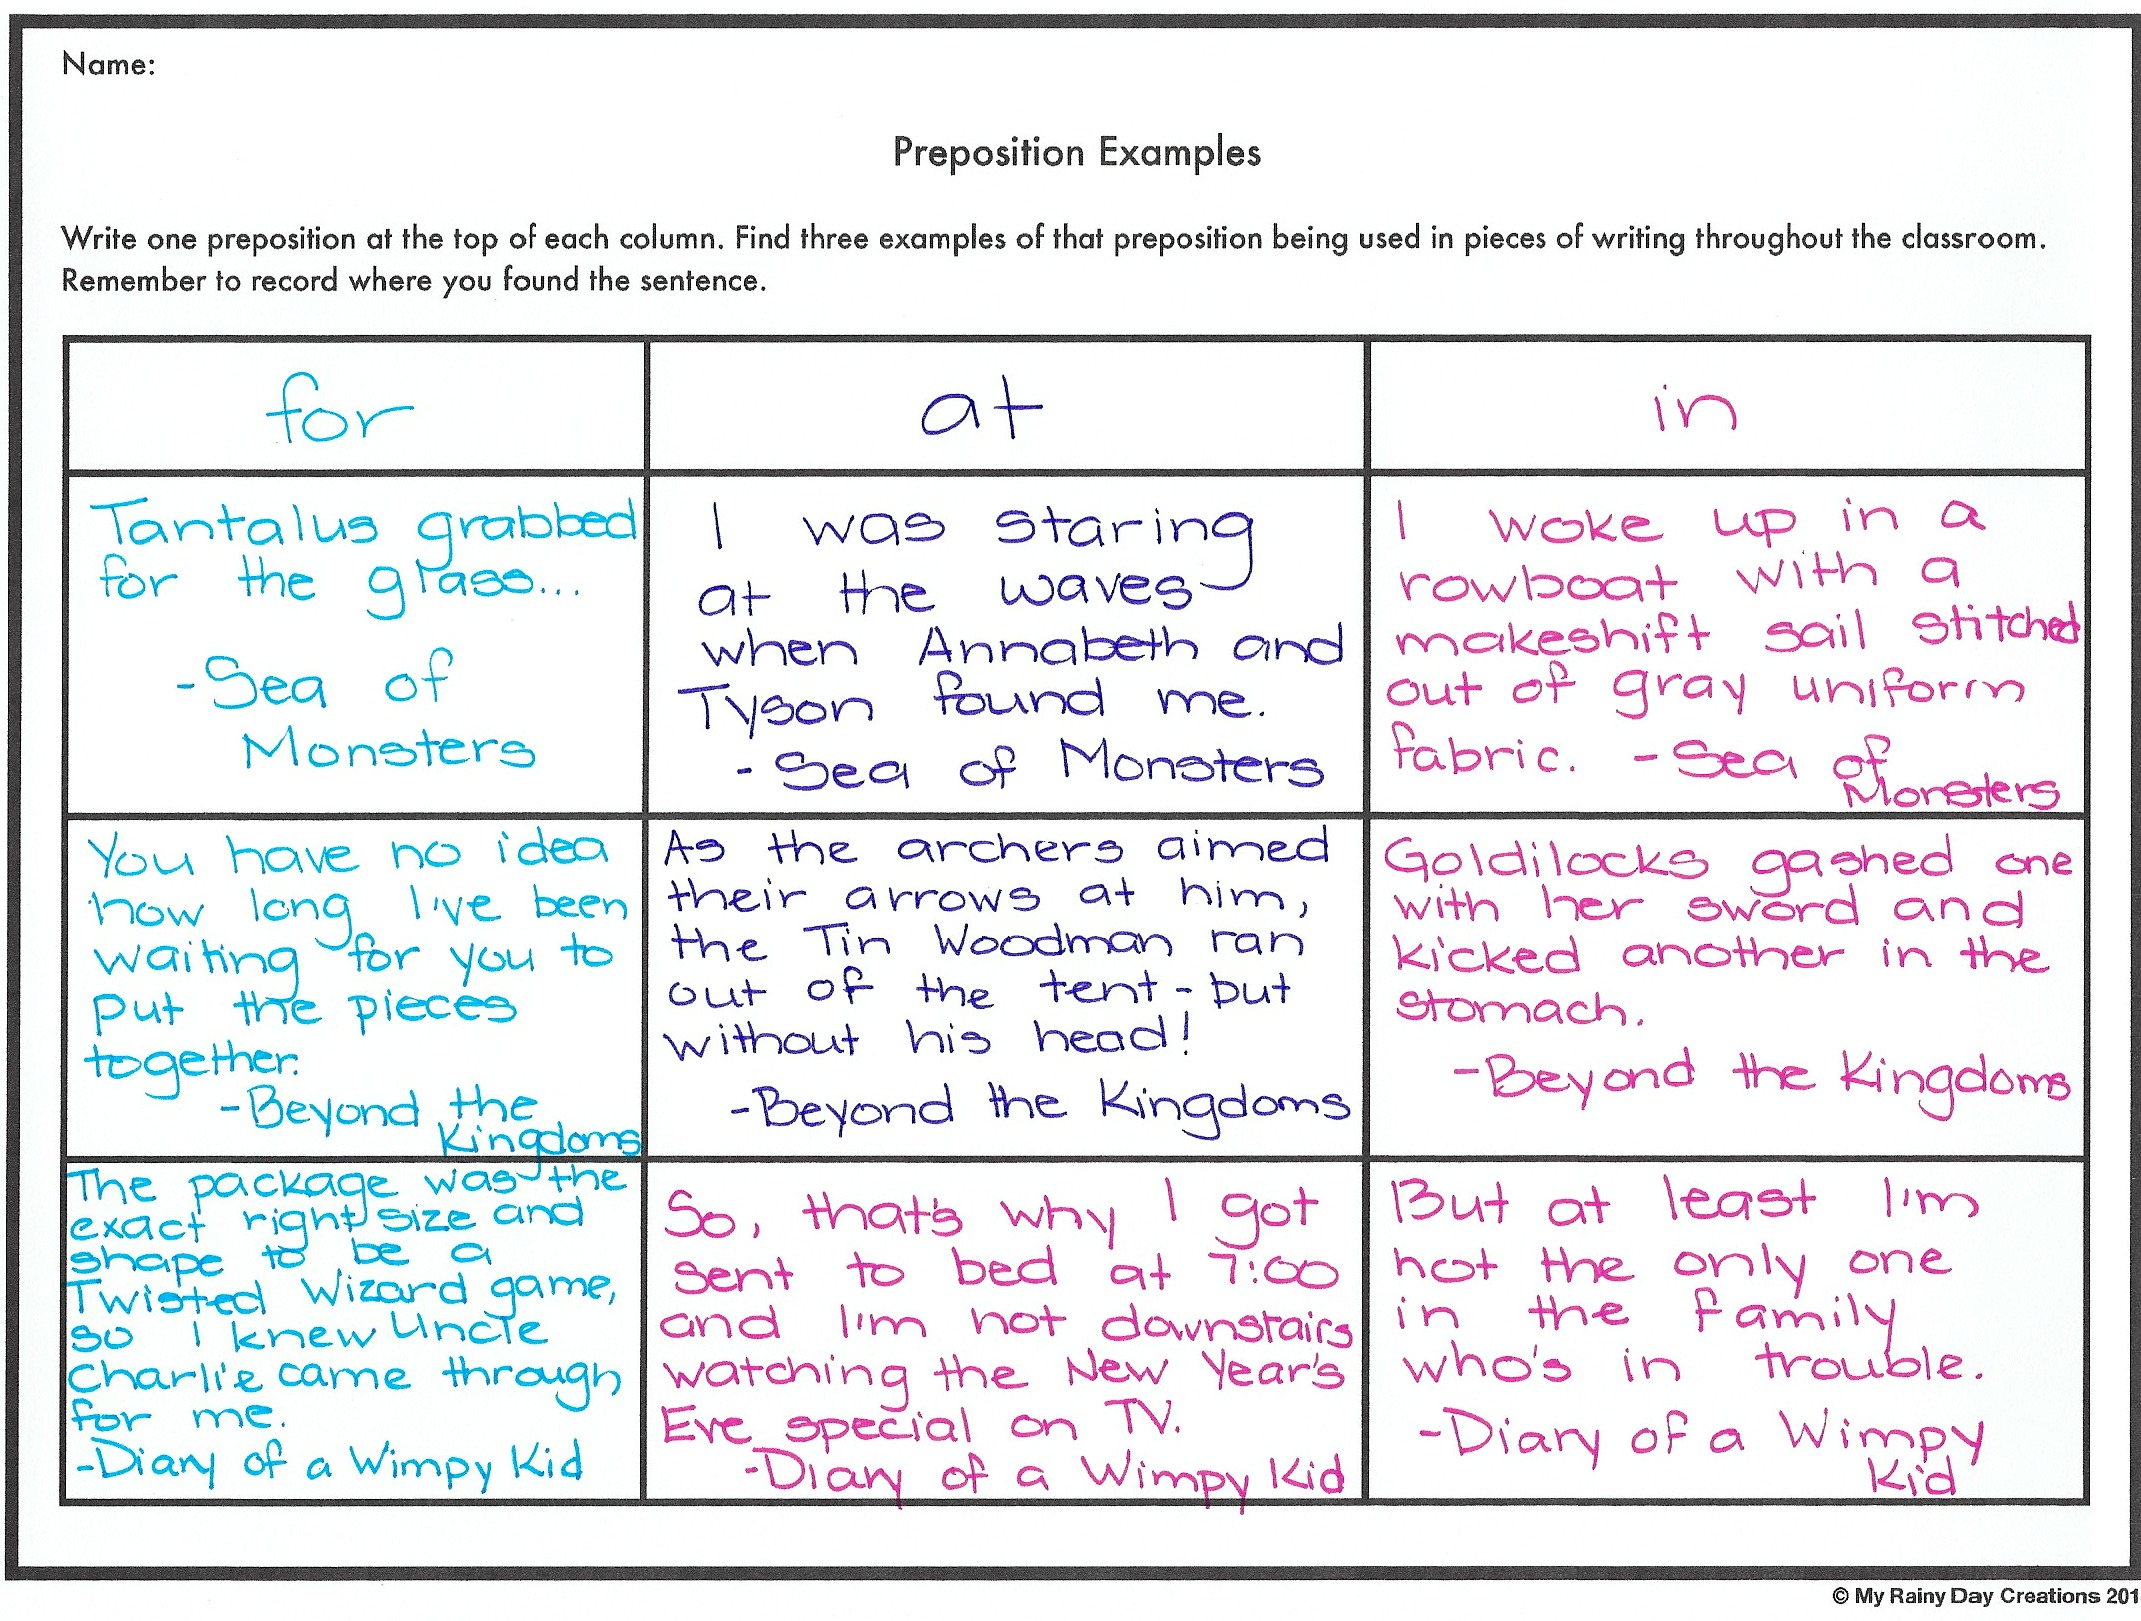 Prepositions-2.jpg